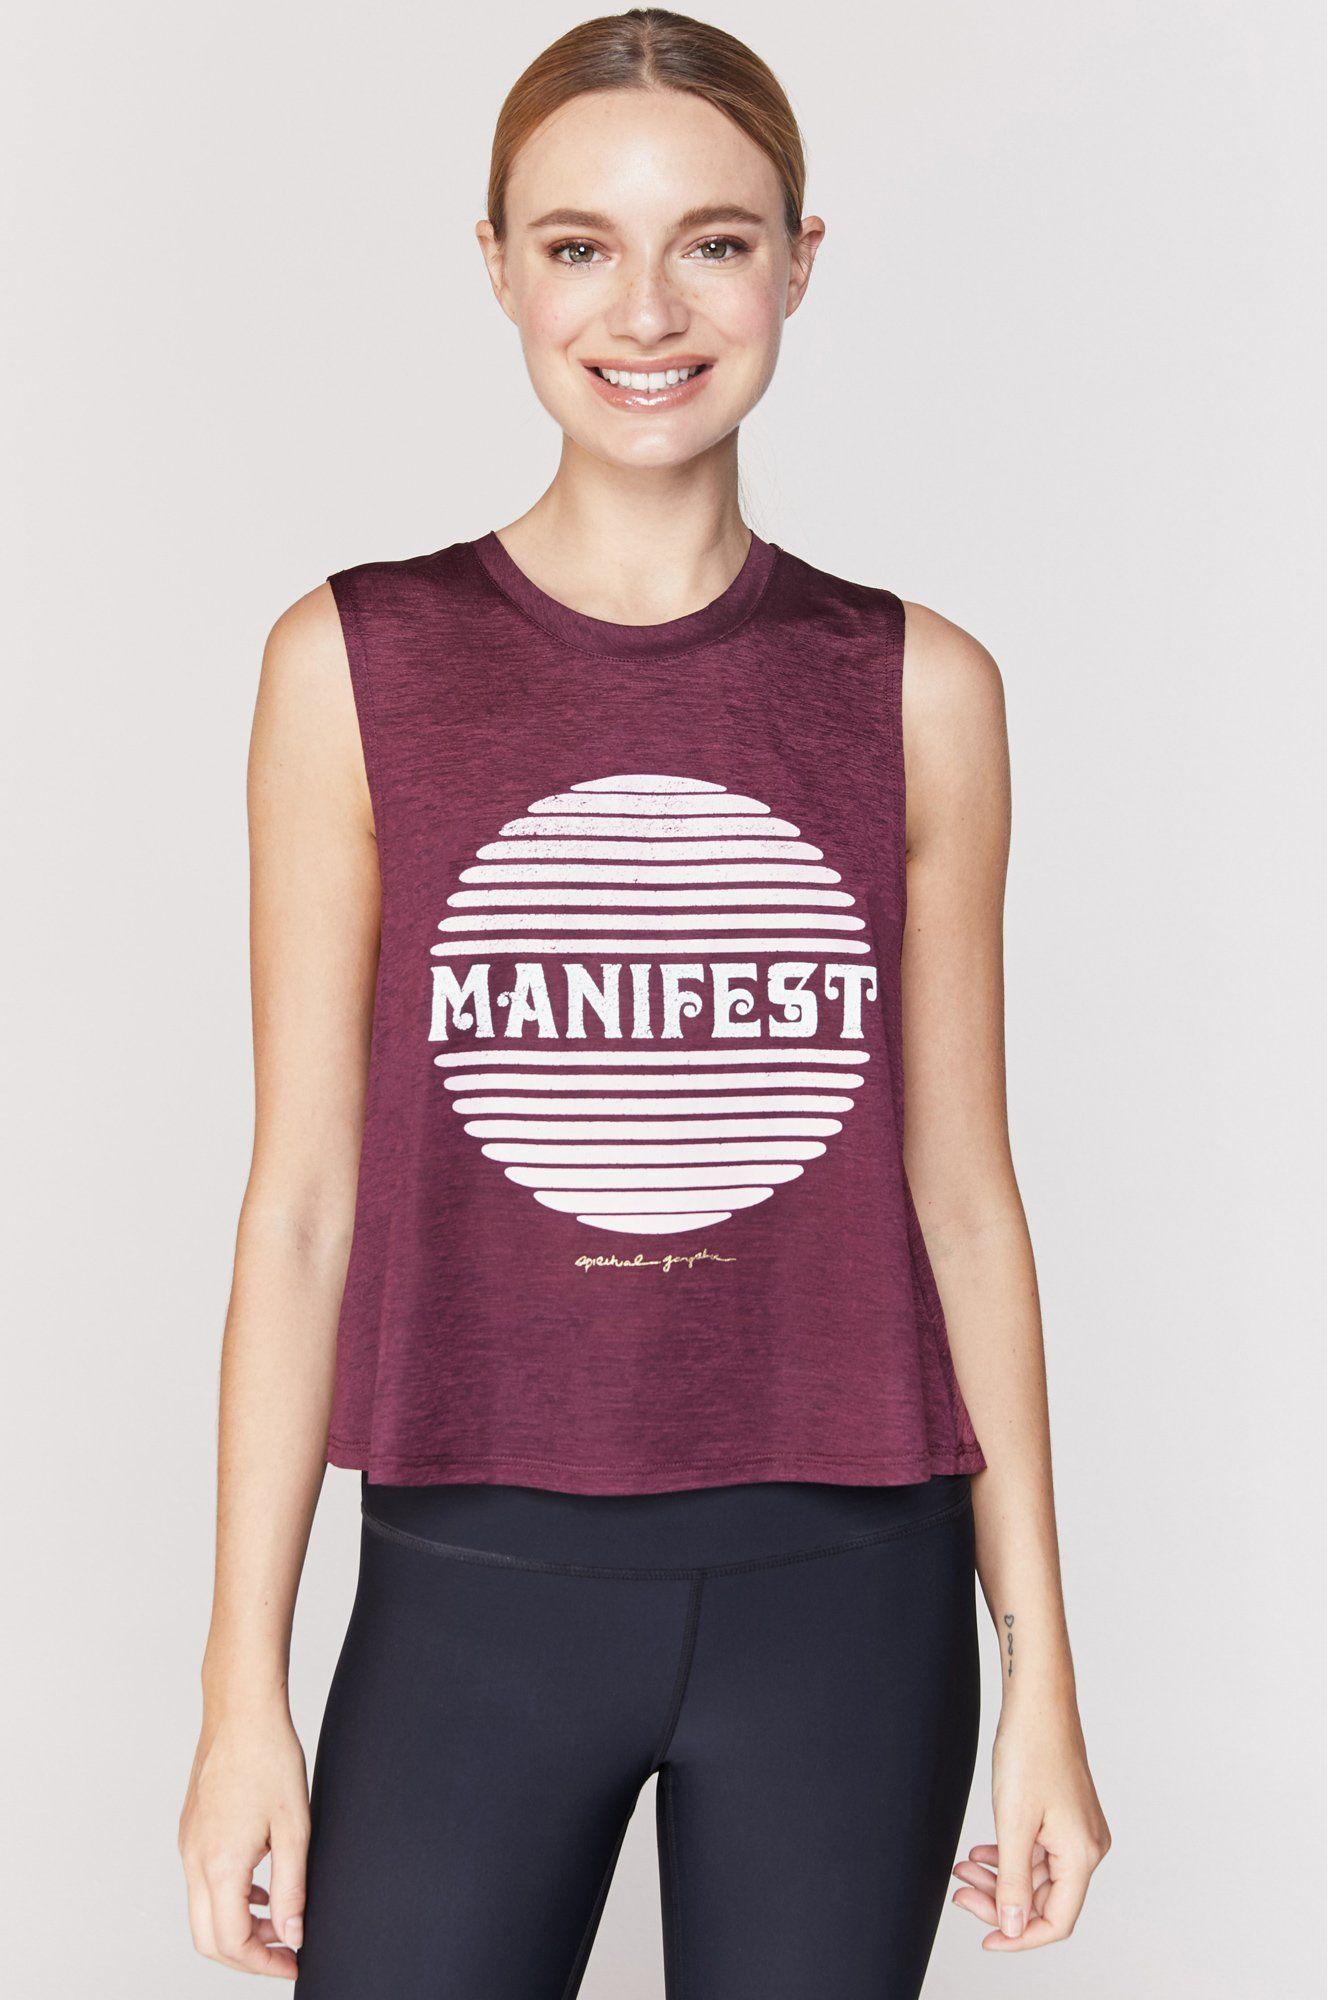 Manifest active crop tank Crop tank, Athleisure outfits